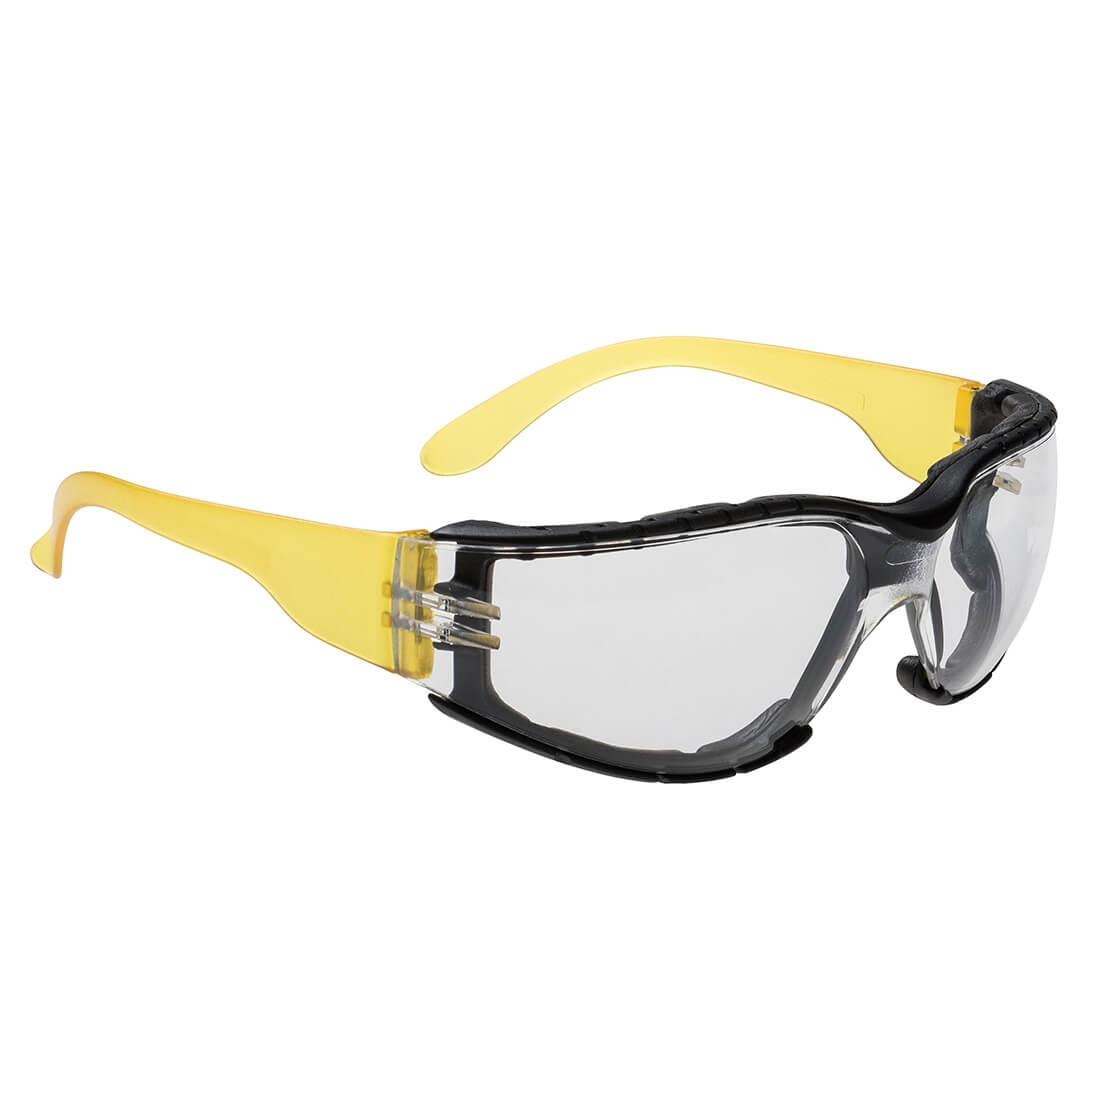 Ochelari Wrap Around Plus - Echipamente de protectie personala